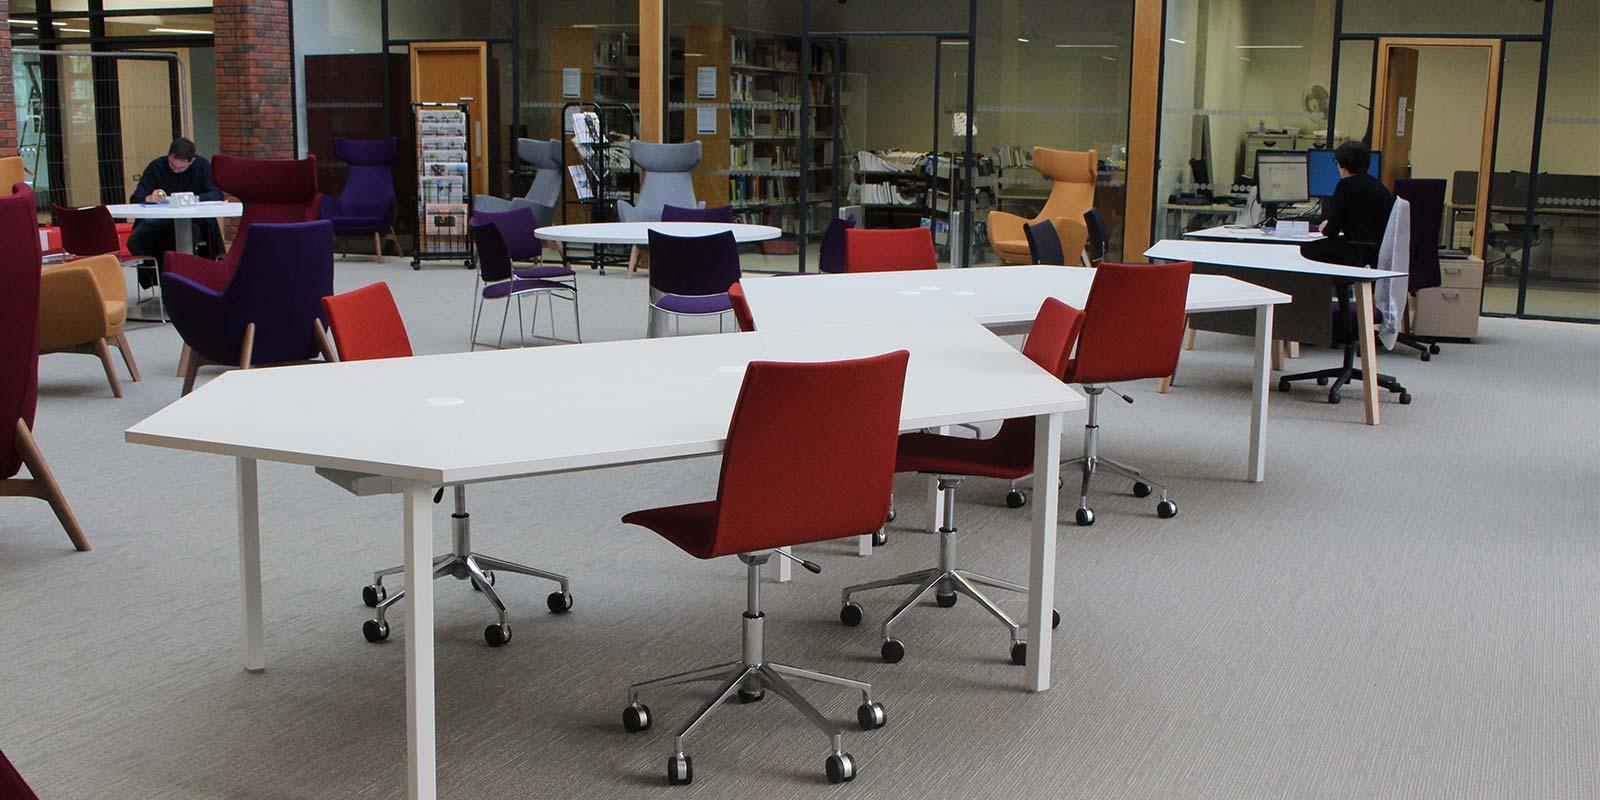 Gluckman Library